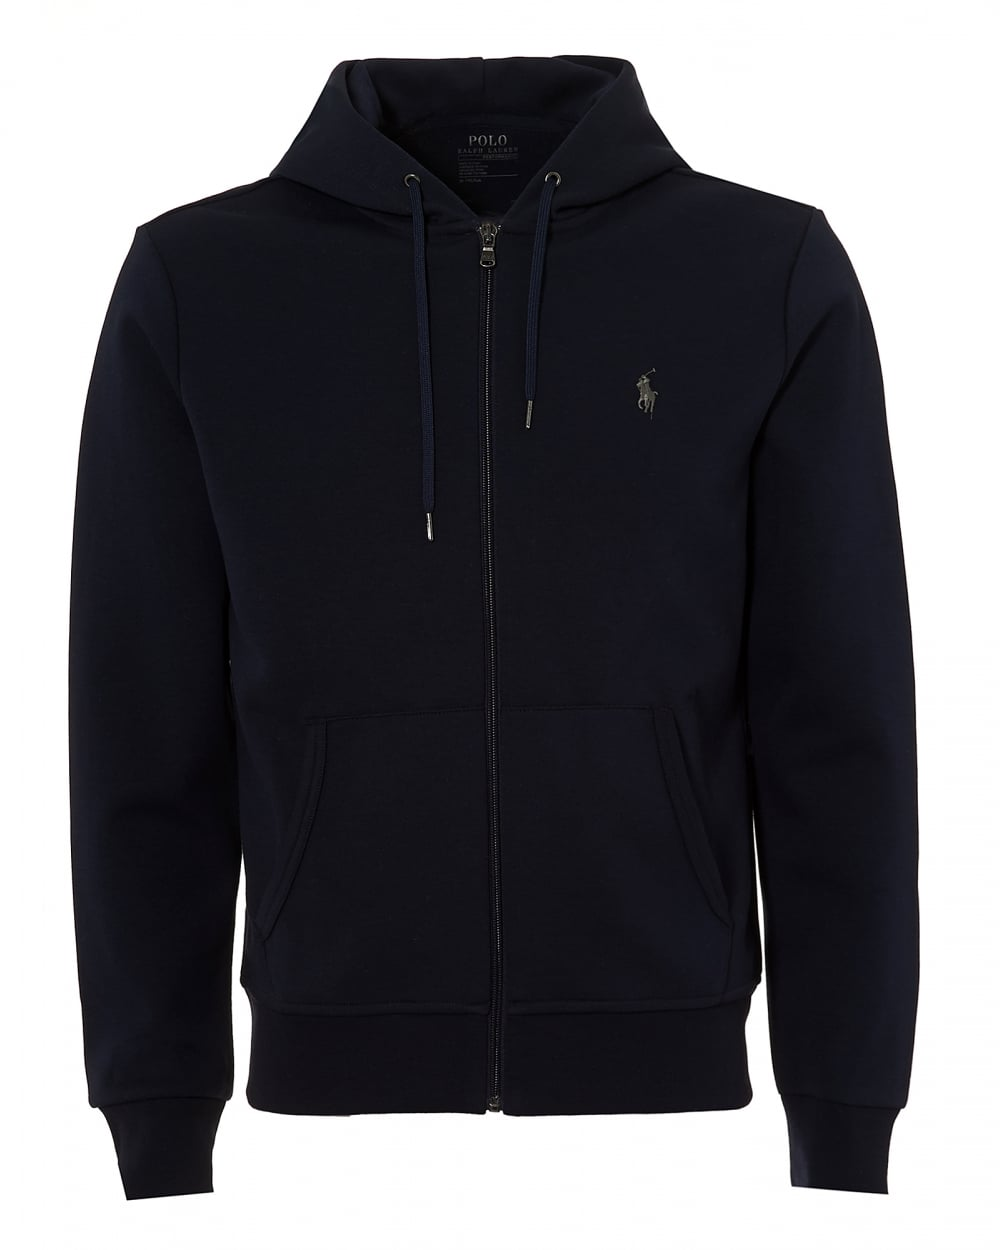 Ralph Lauren Mens Hooded Navy Blue Sweatshirt 43b9279118f